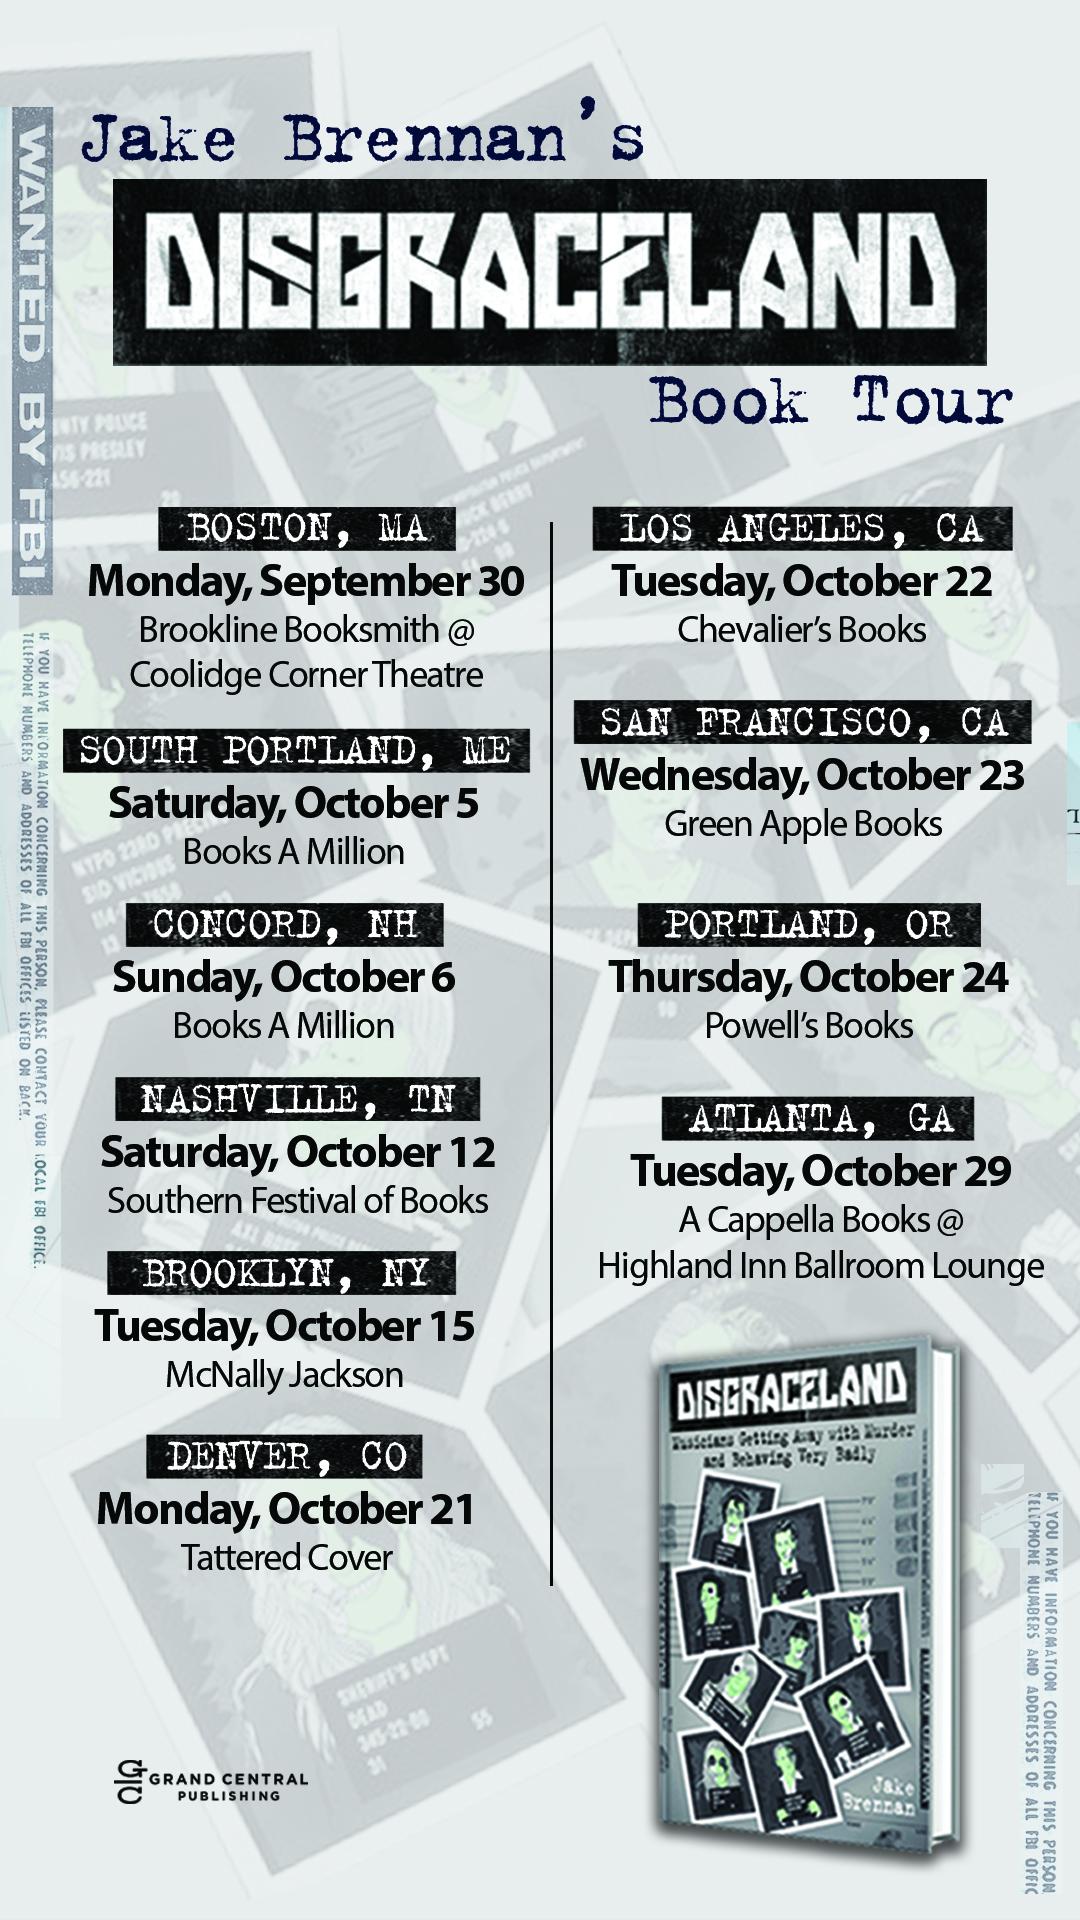 Disgraceland Book Tour